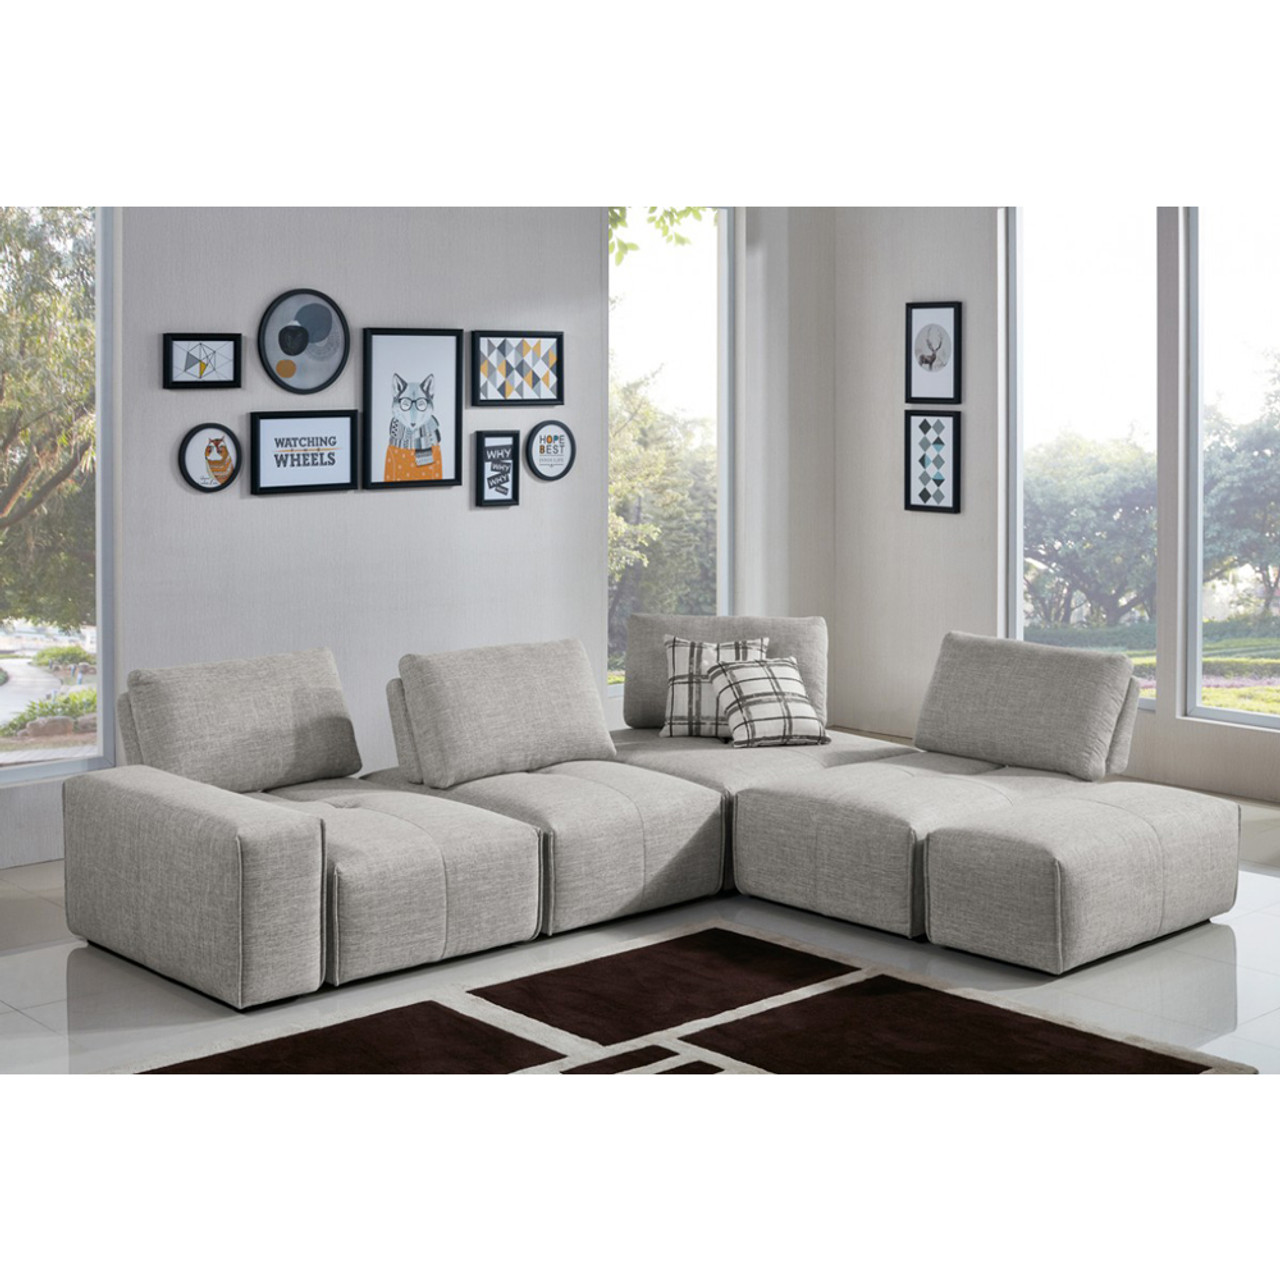 Stupendous Divani Casa Platte Modern Grey Fabric Modular Sectional Sofa Uwap Interior Chair Design Uwaporg